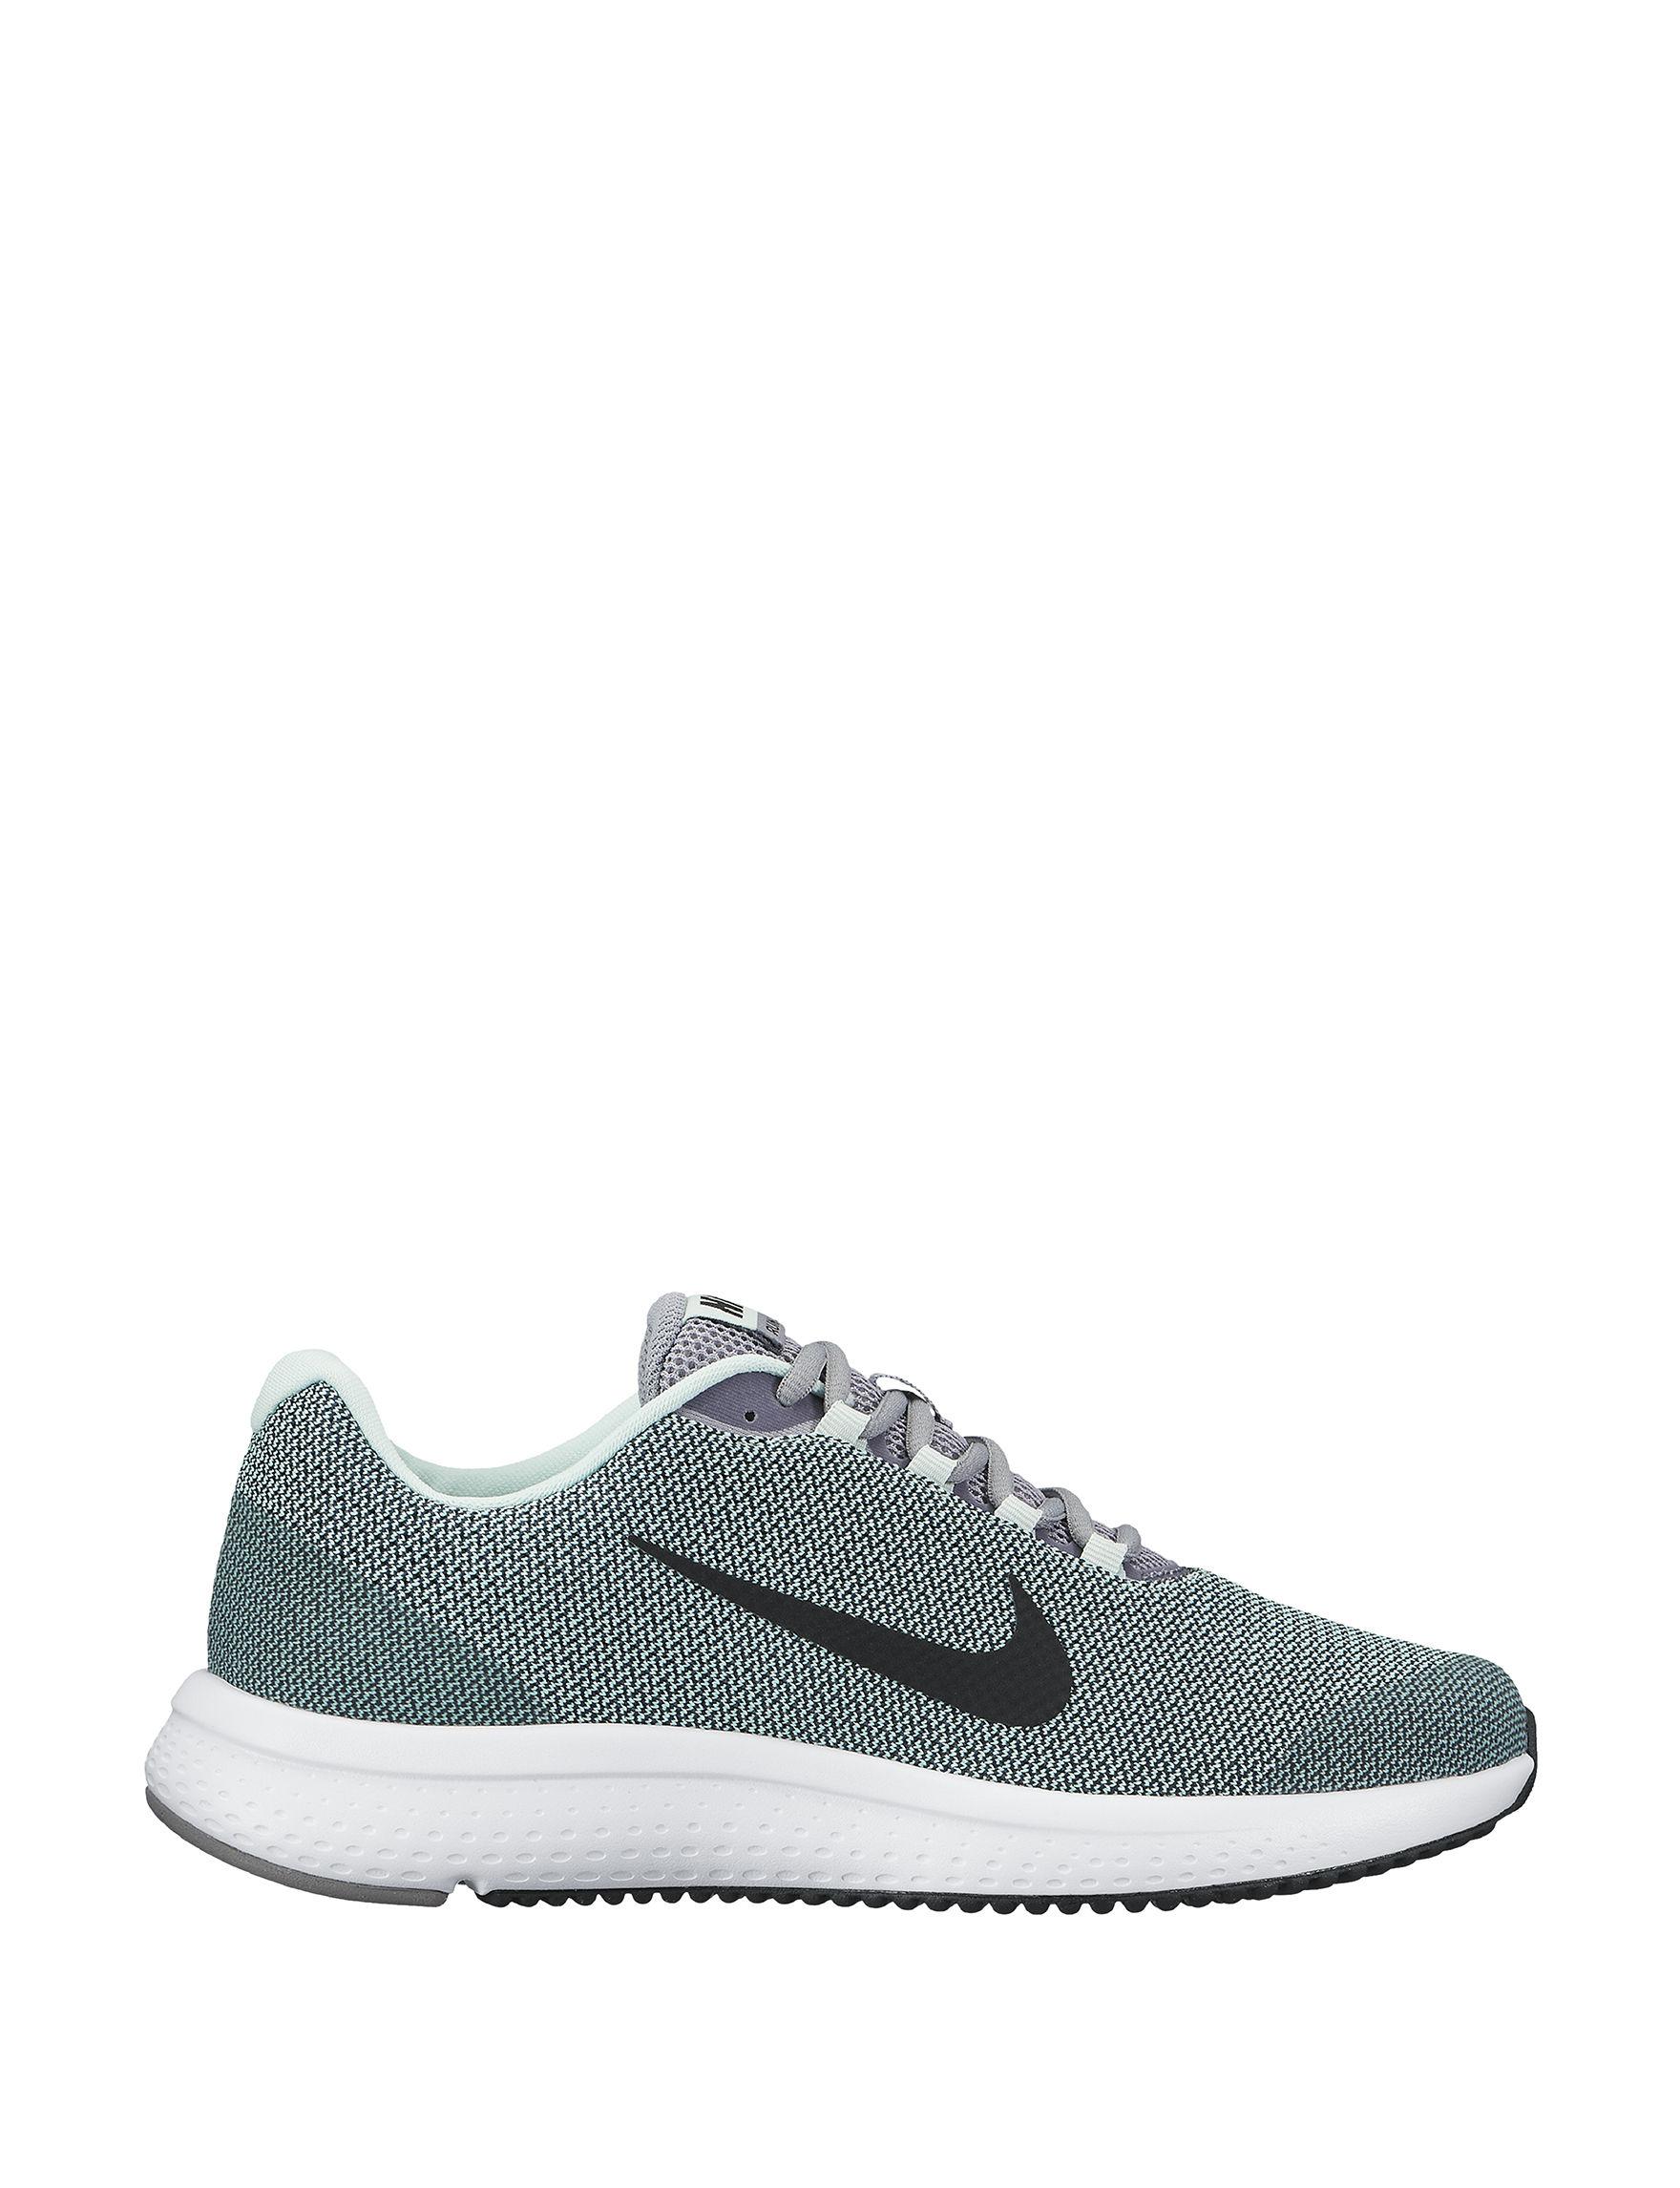 Nike Blue / Black